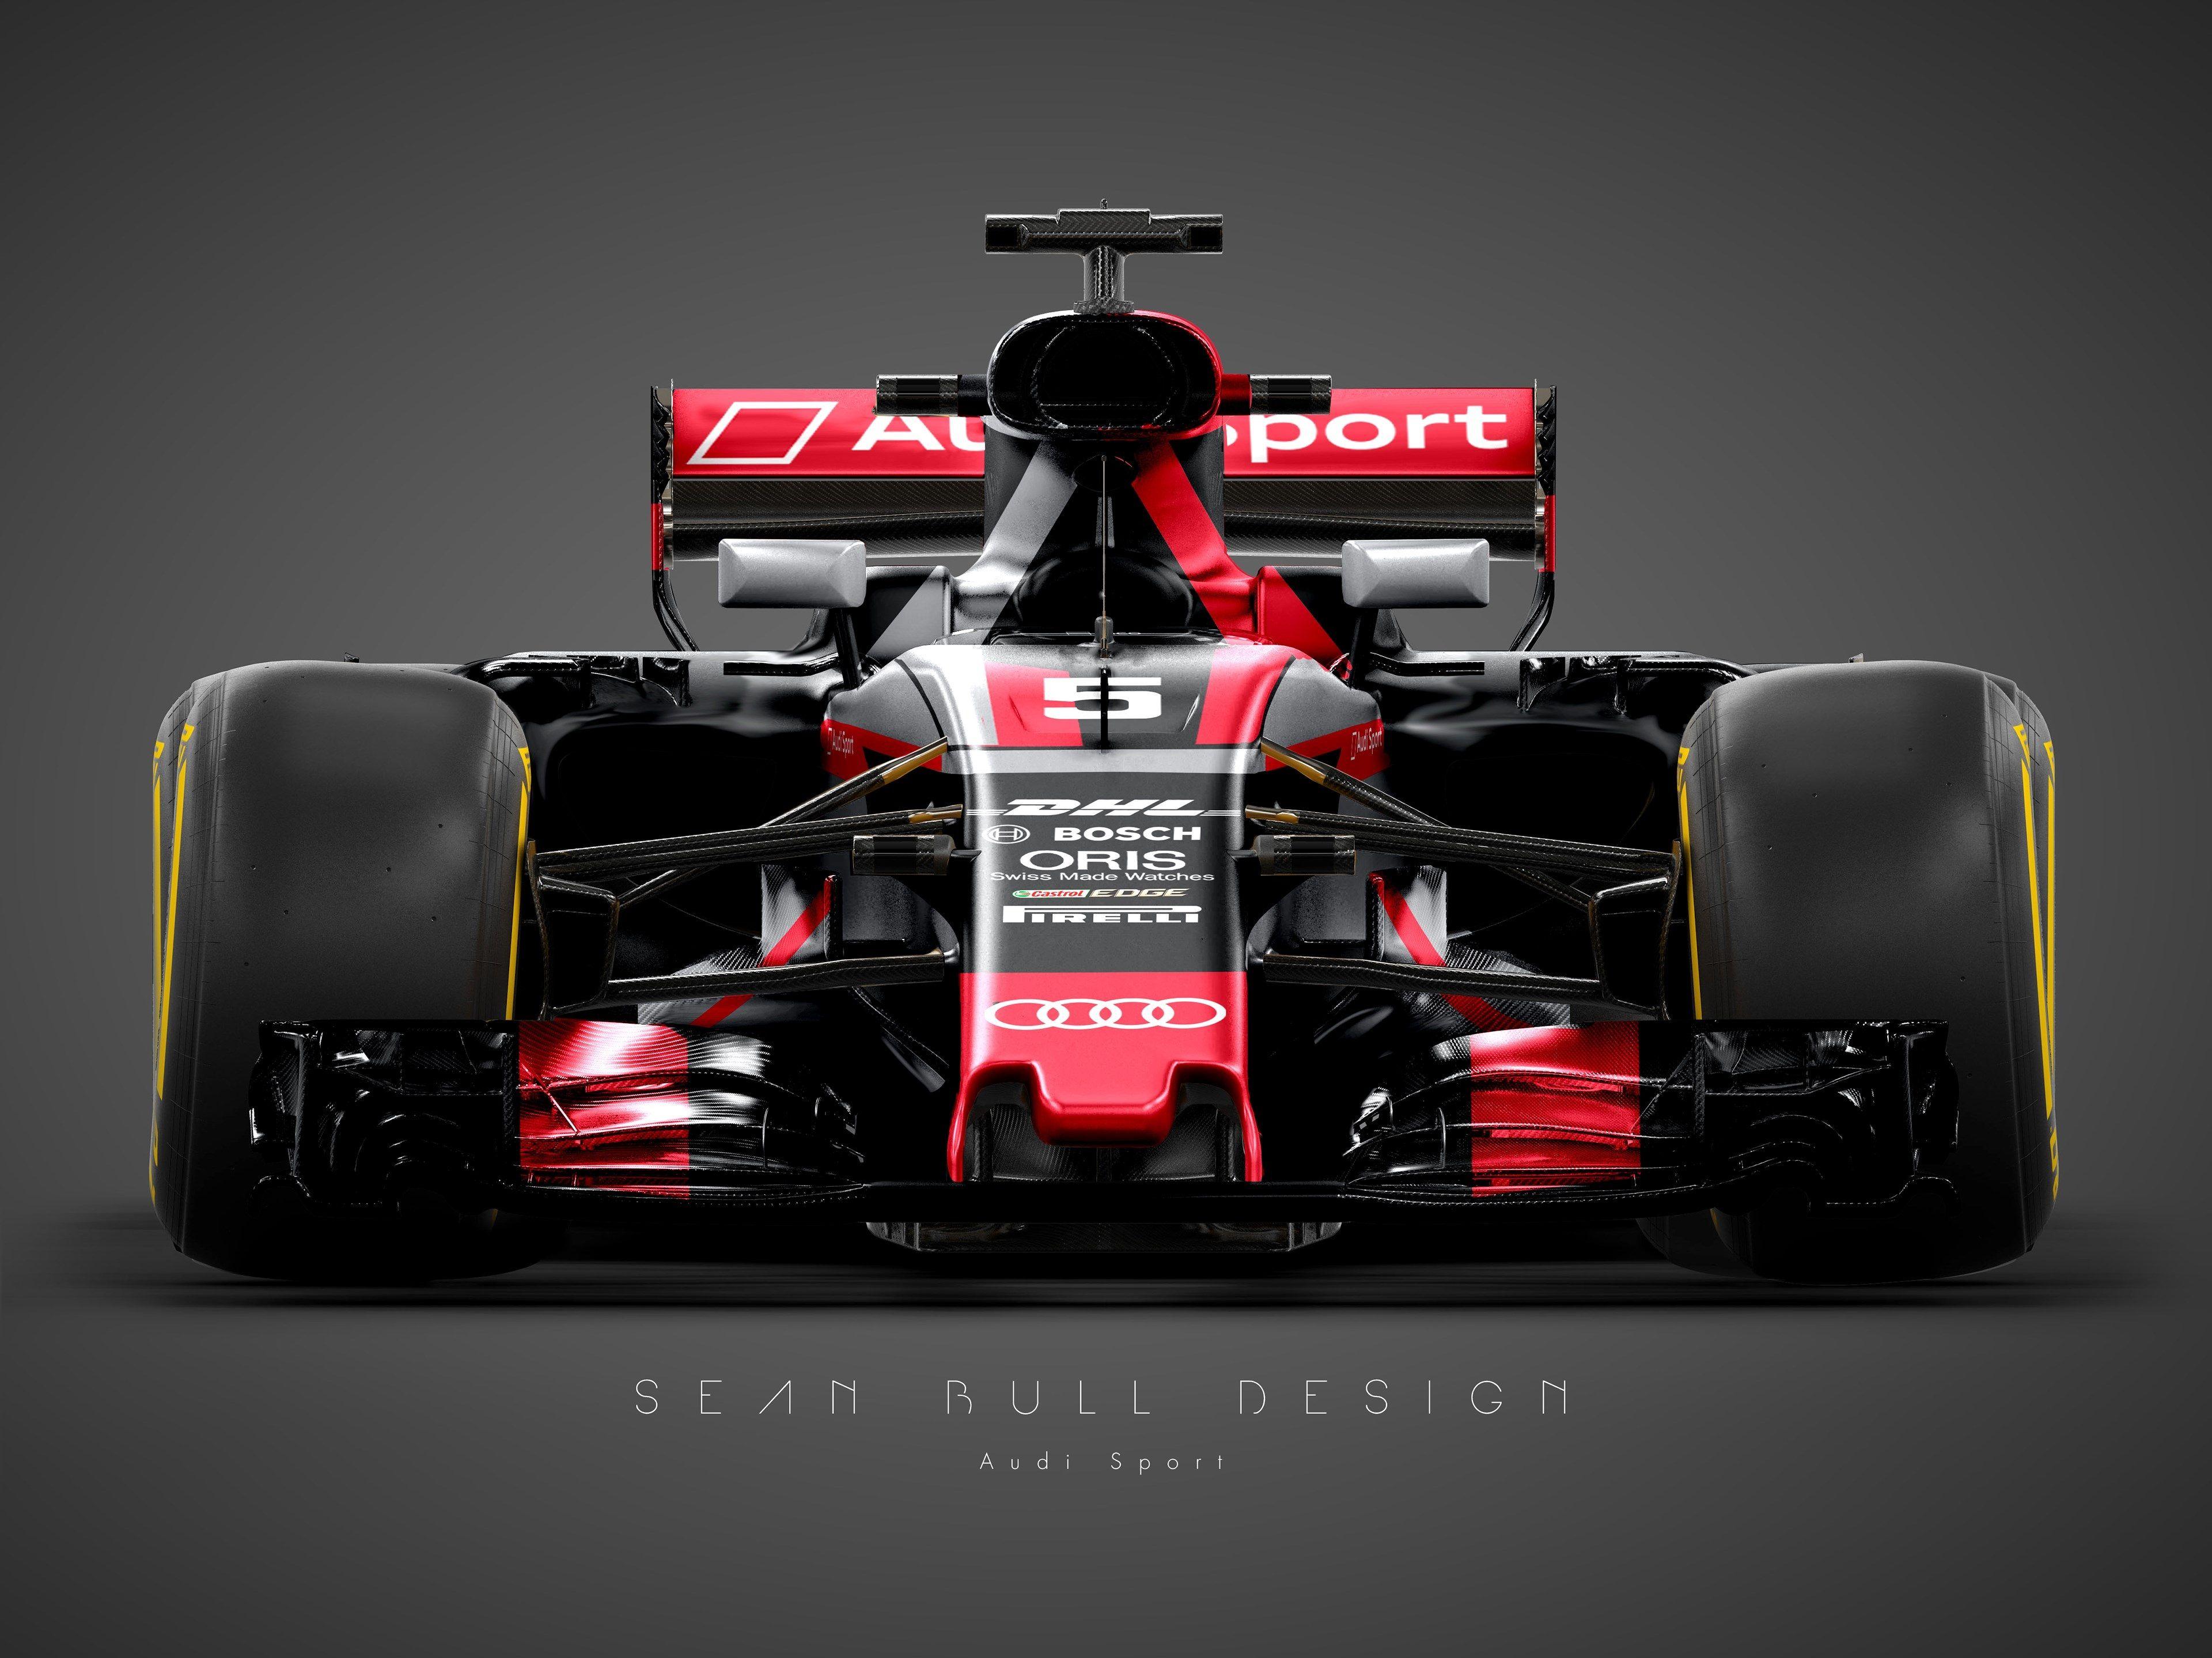 3840x2878 Audi Sport F1 4k Wallpaper Screensaver Audi Formula 1 Audi Sport